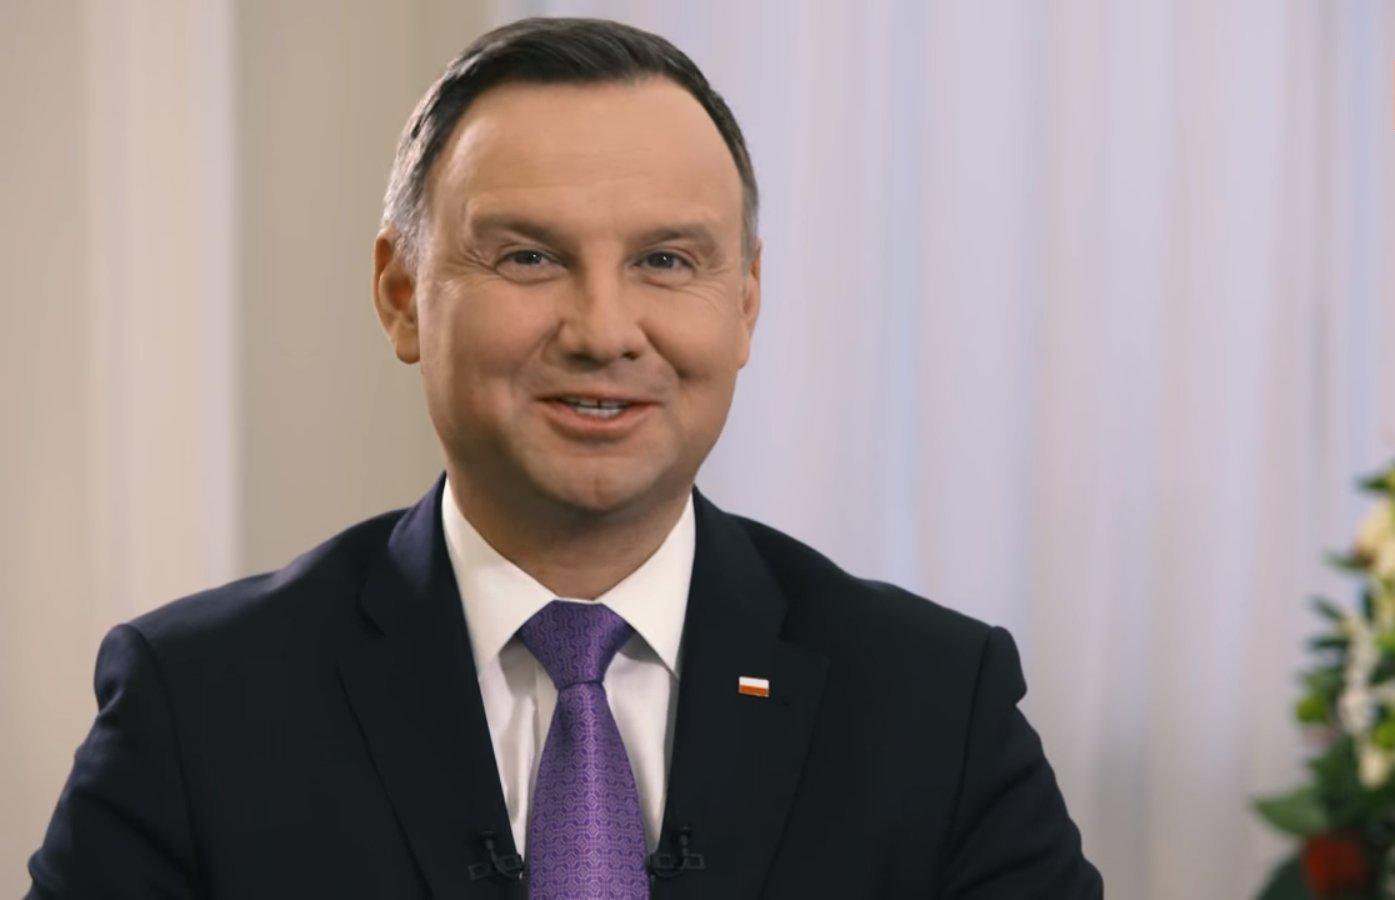 sondaż - Andrzej Duda